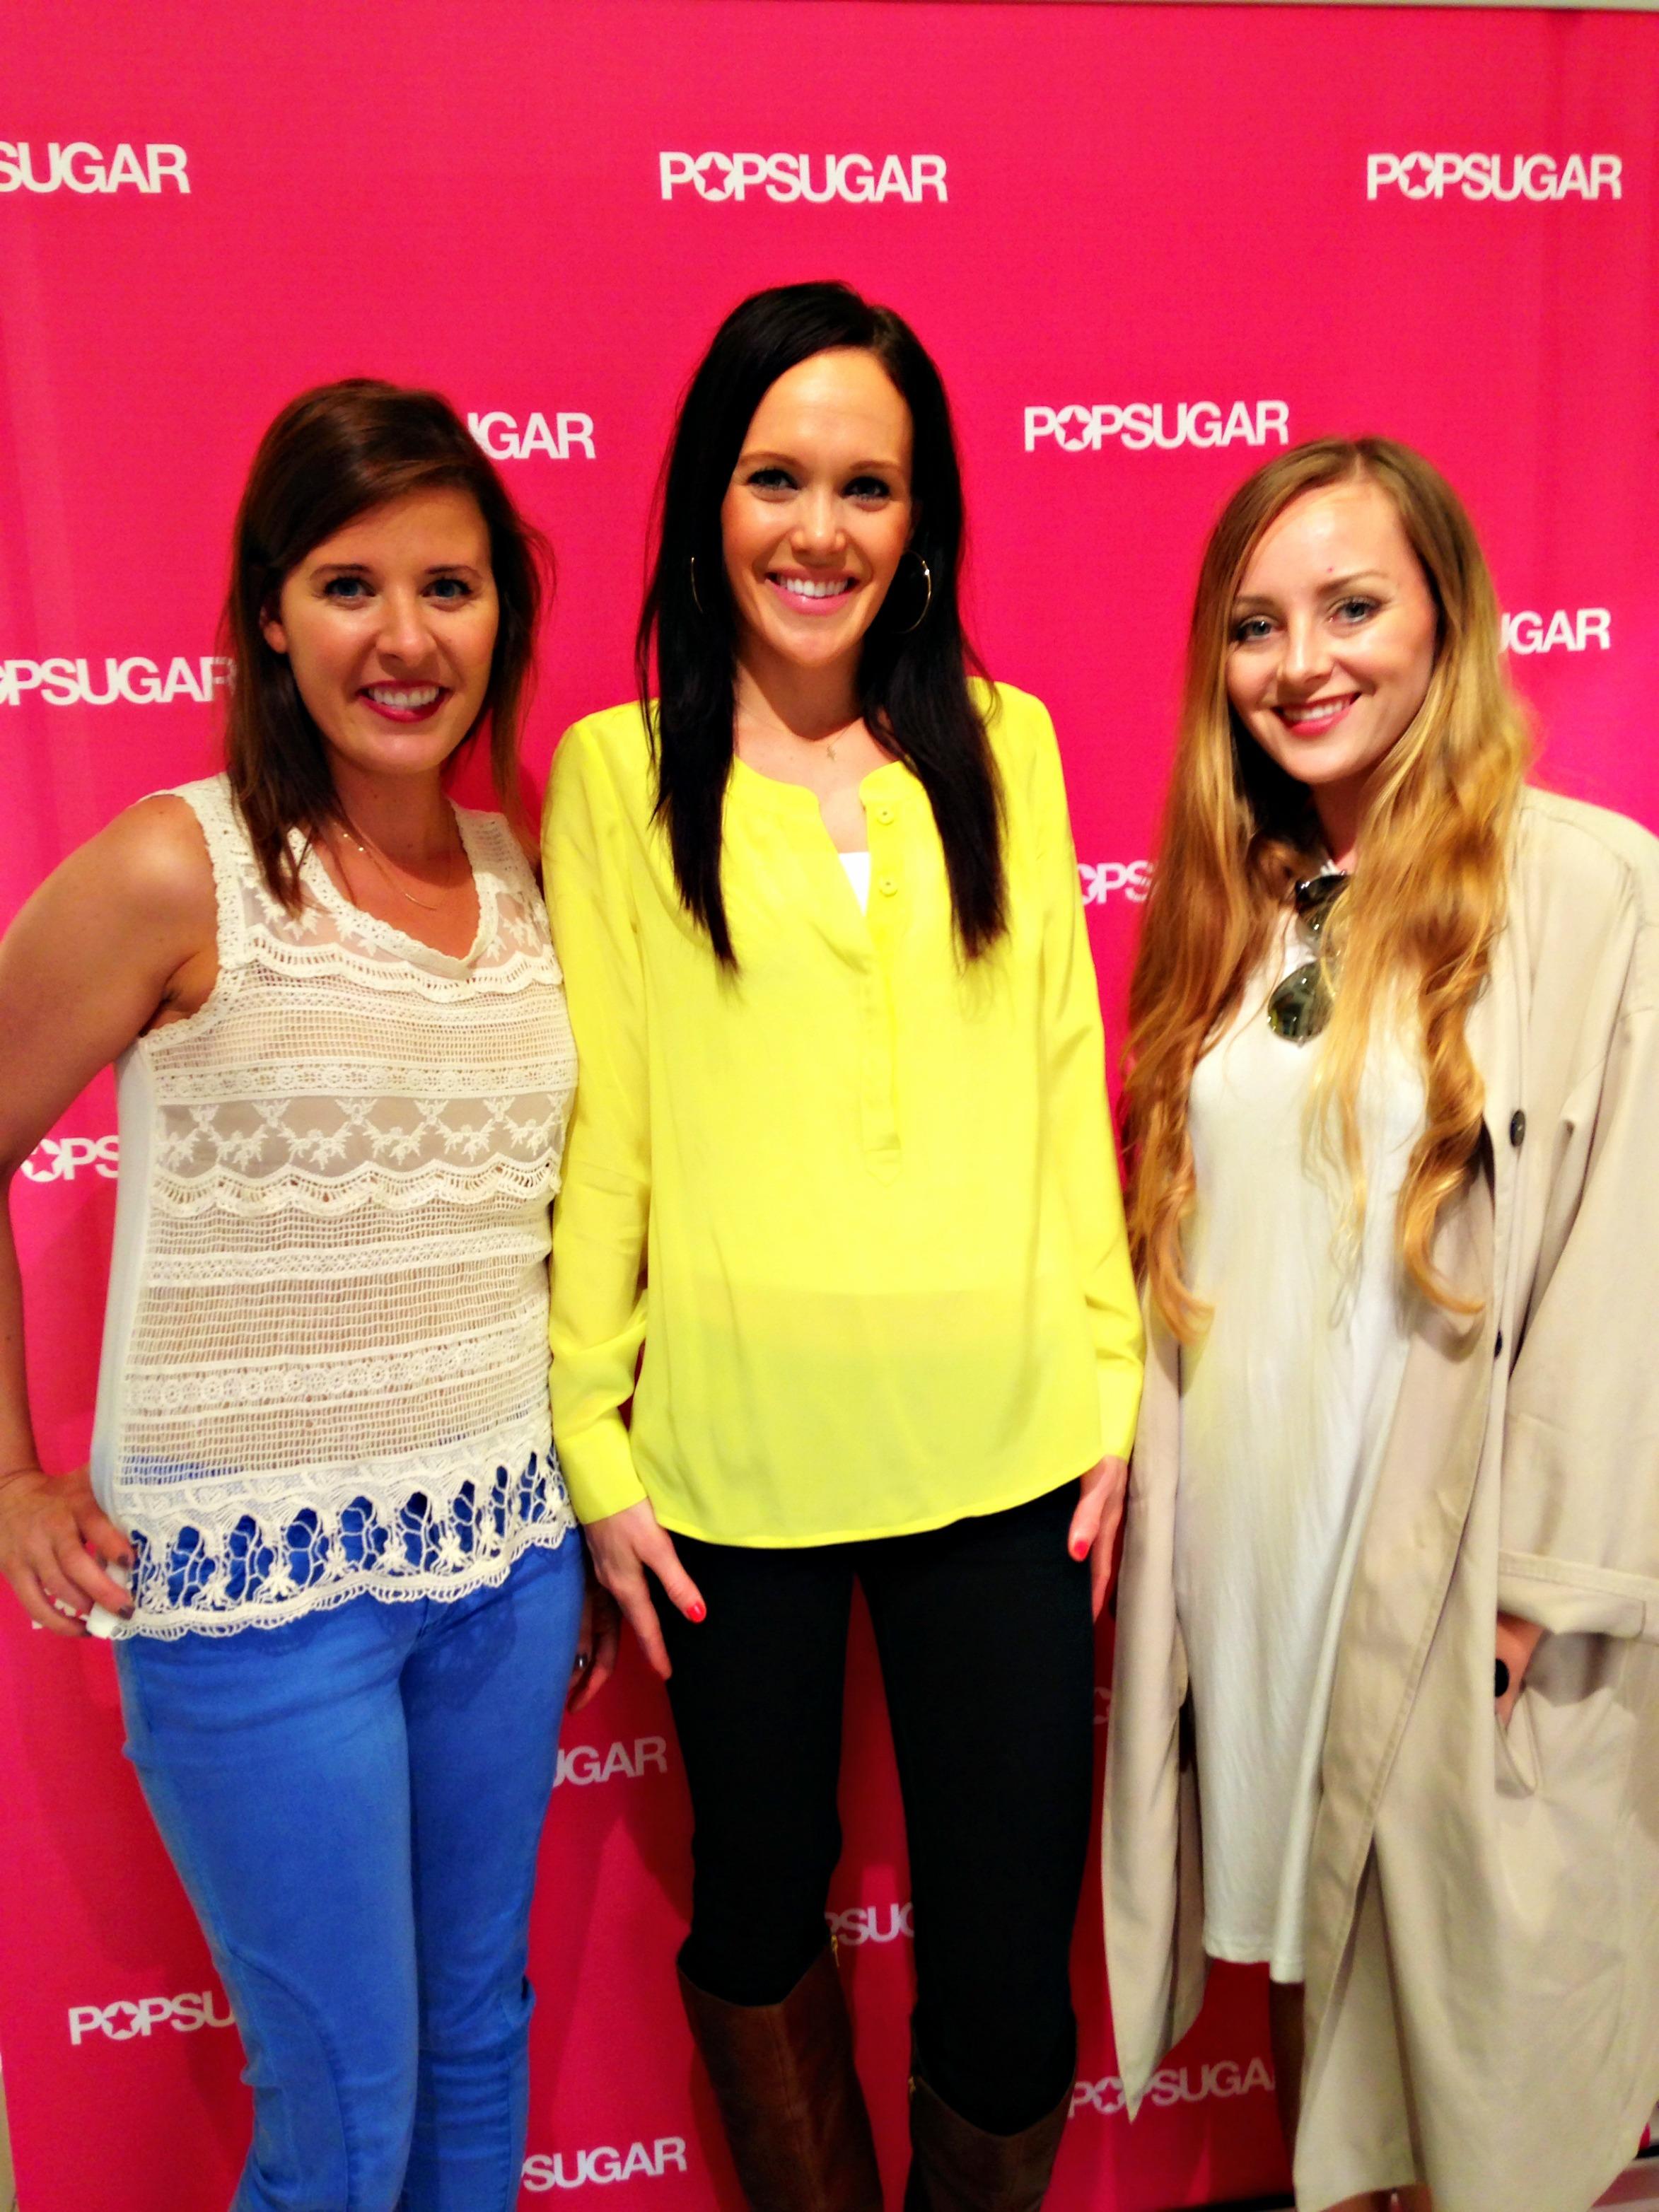 POPSUGAR Blog event